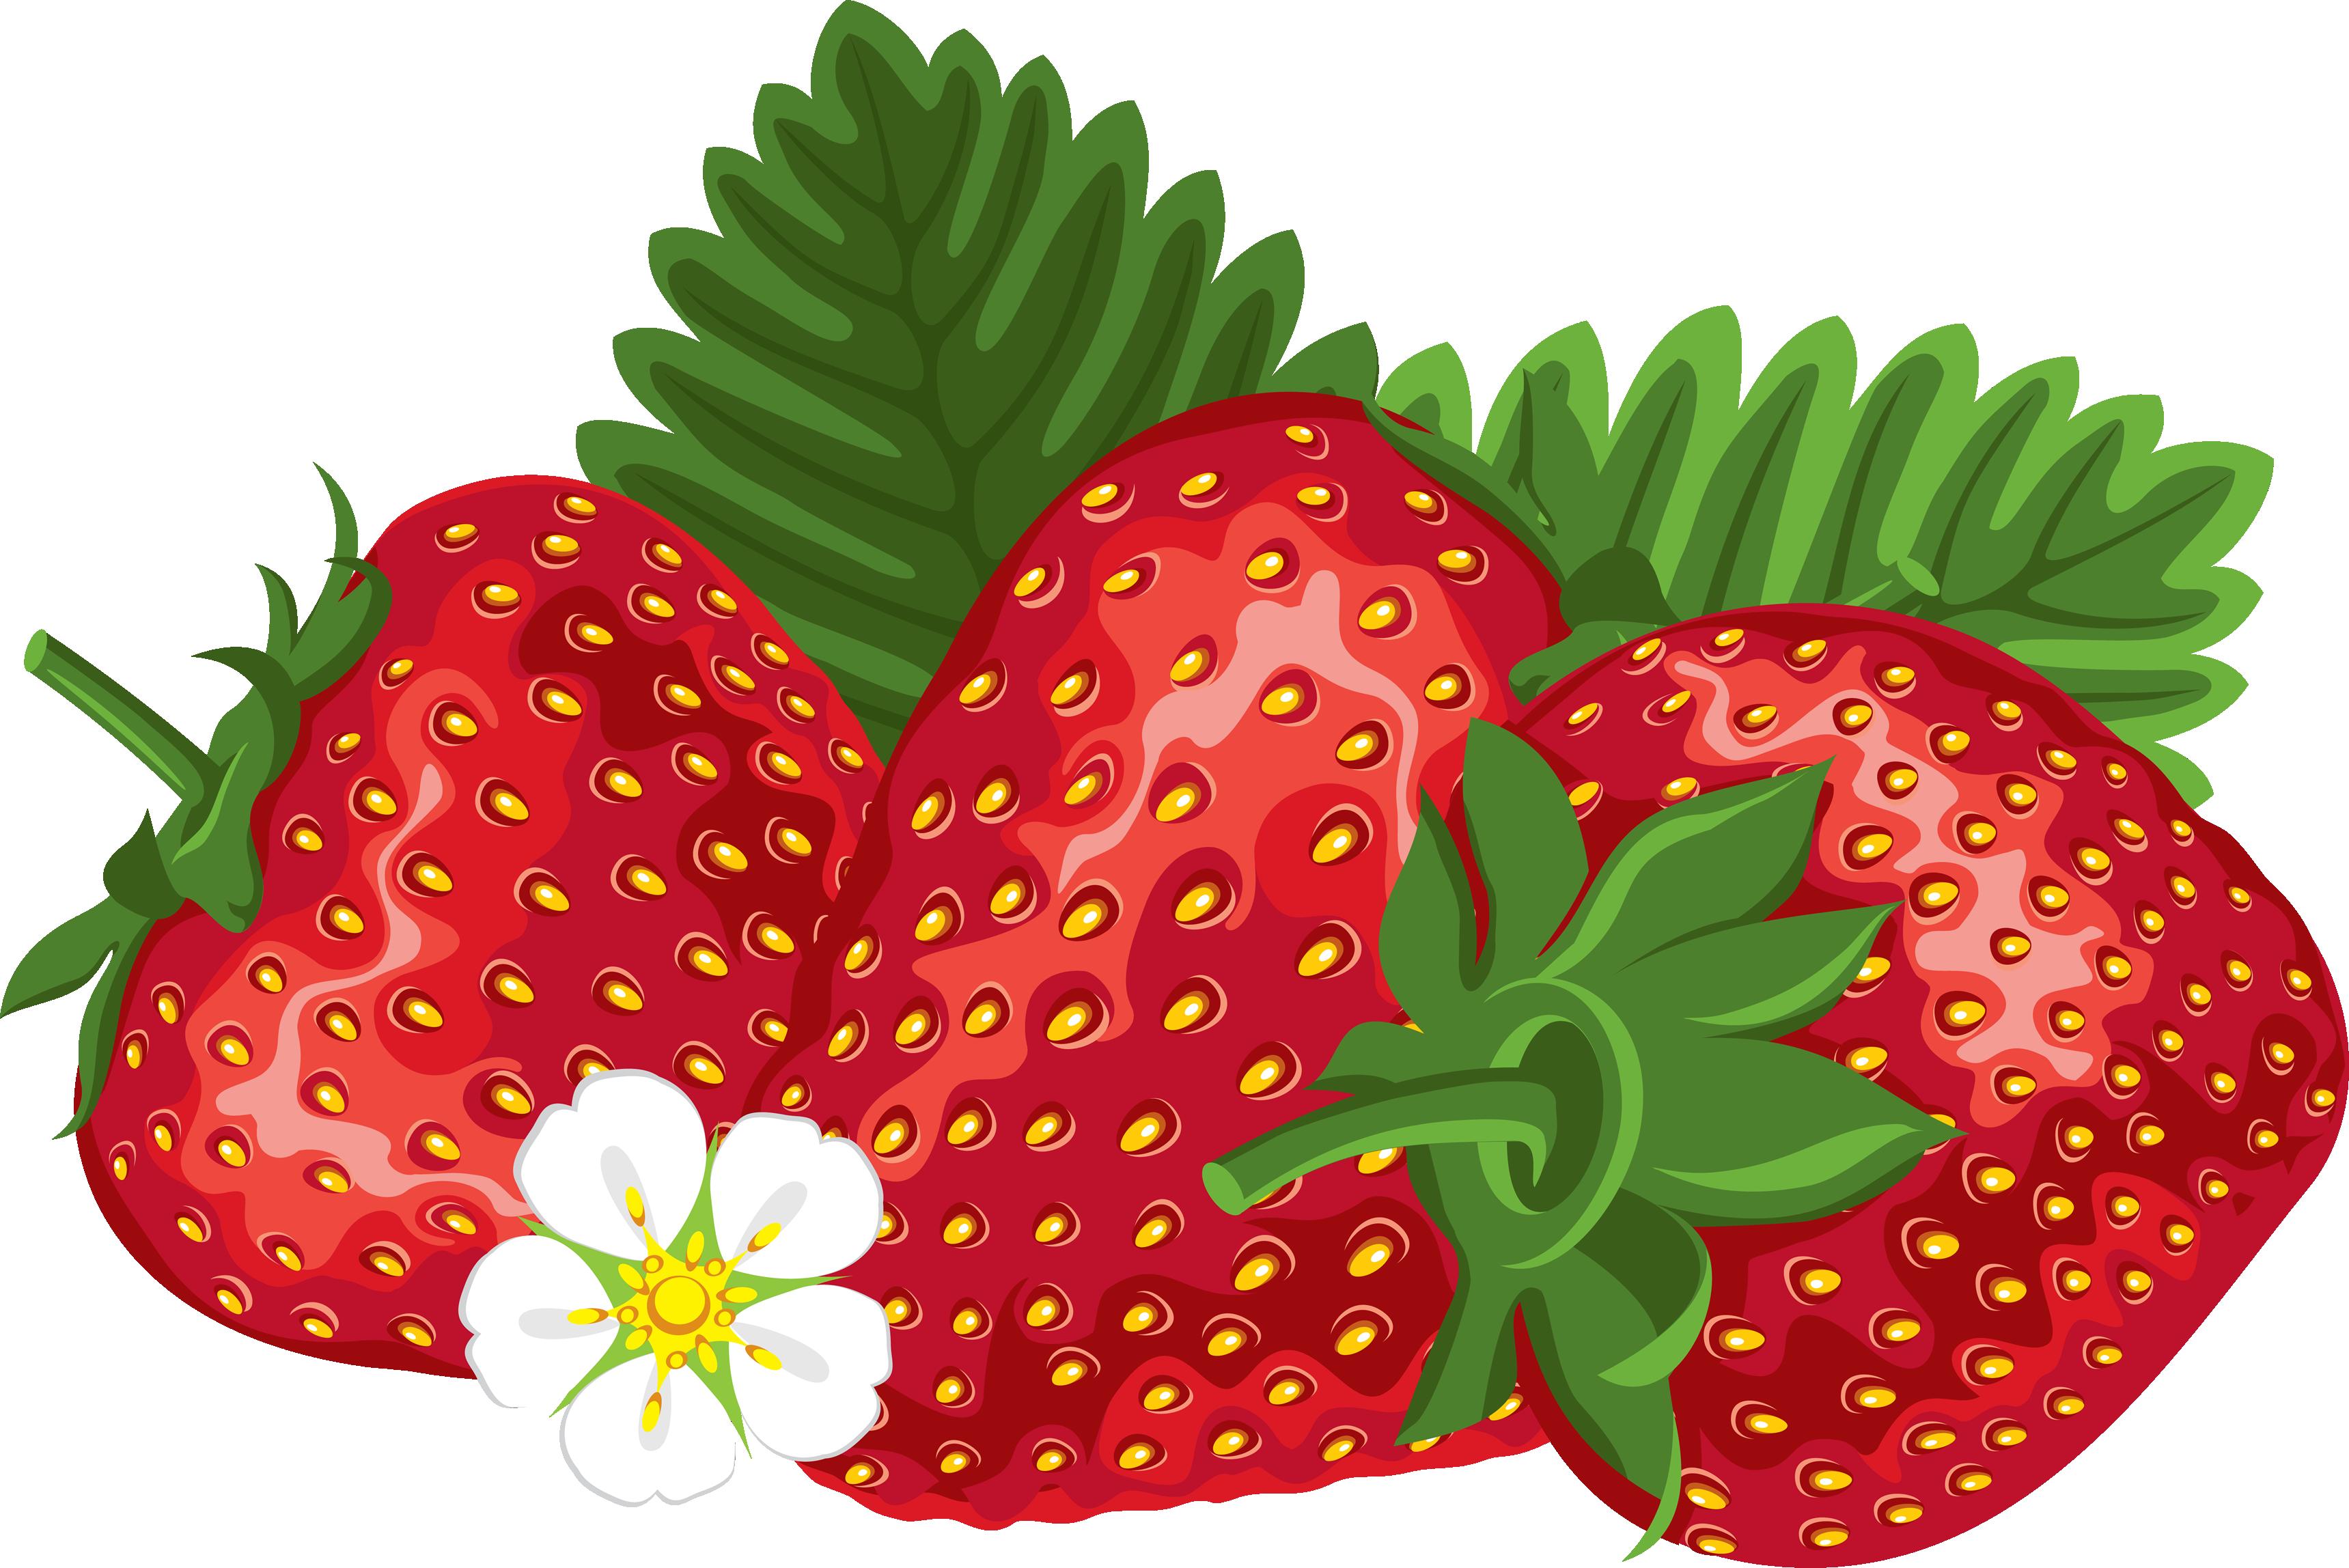 Strawberries clipart watermelon. Pin by luke on